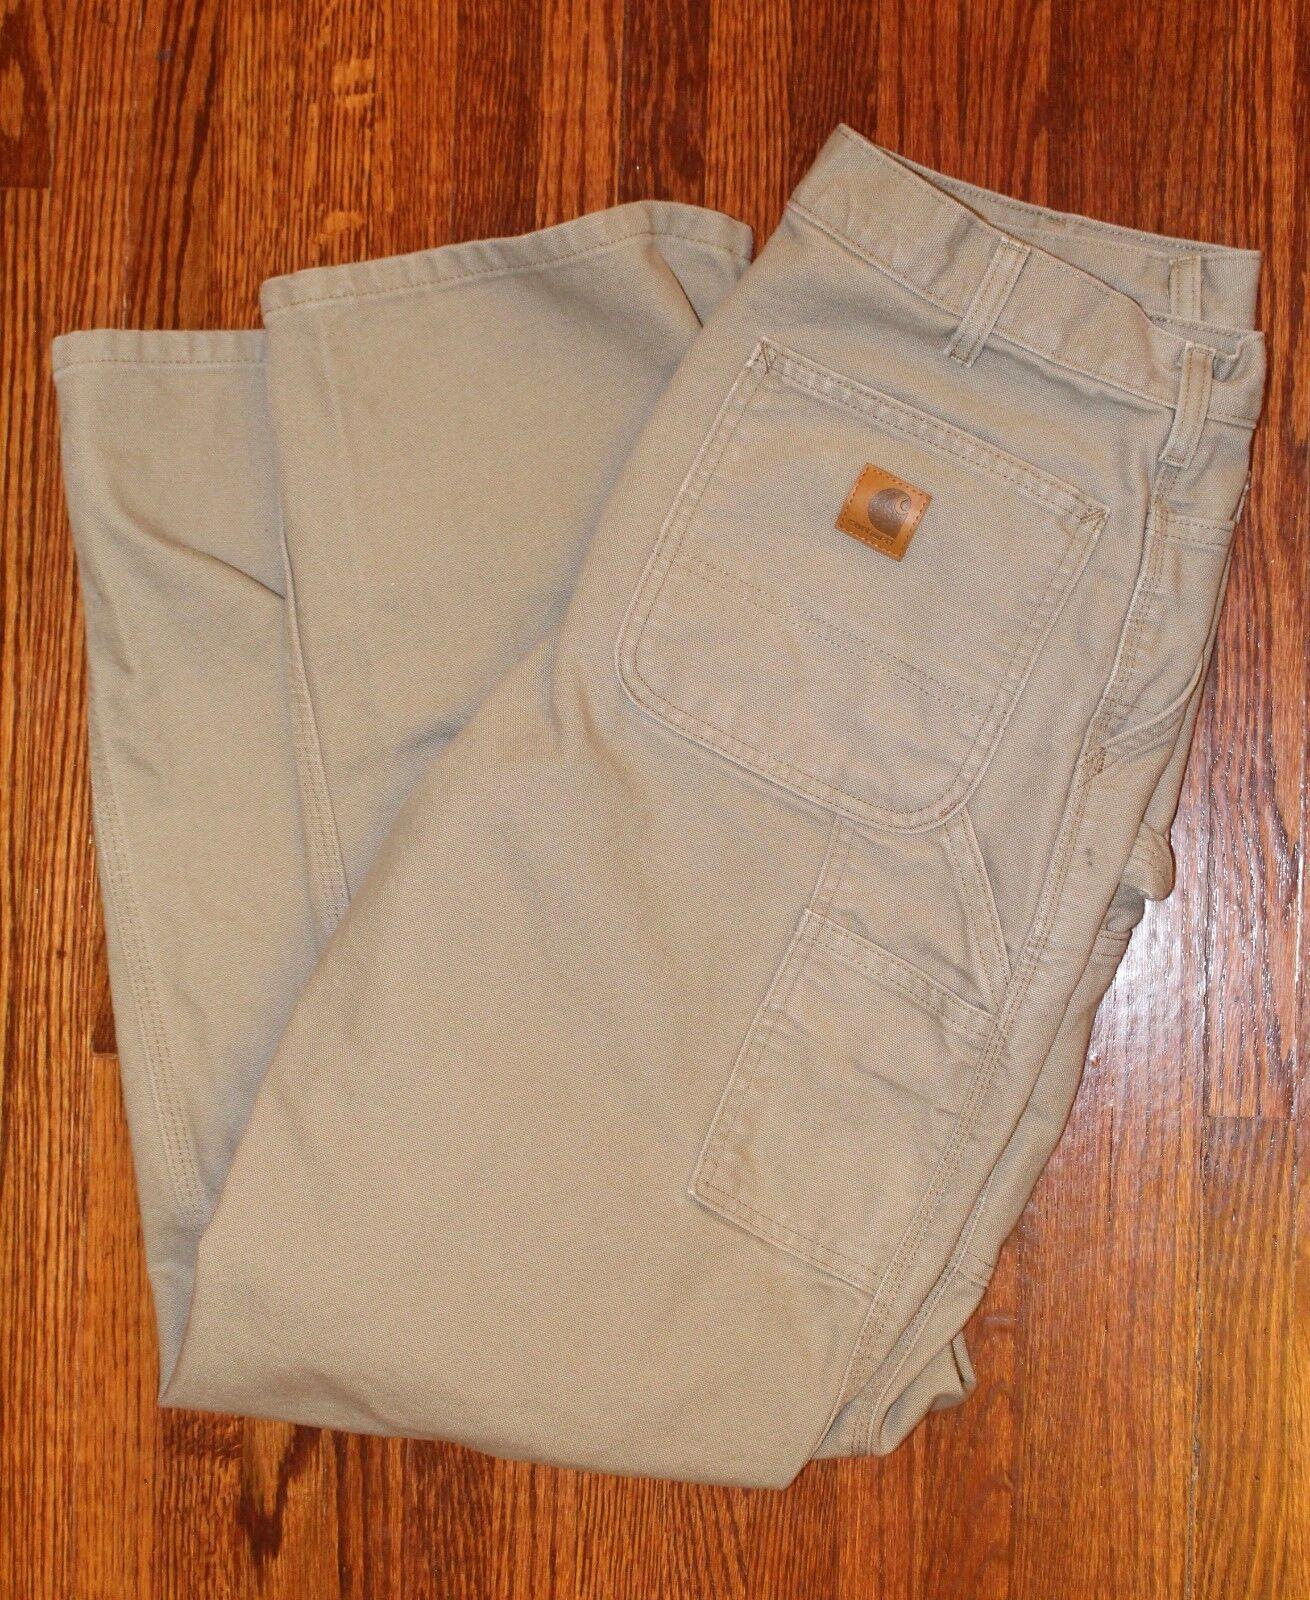 Carhartt Original Dungaree Fit Canvas Work Pants Men's 34  x 34  - B11 DES